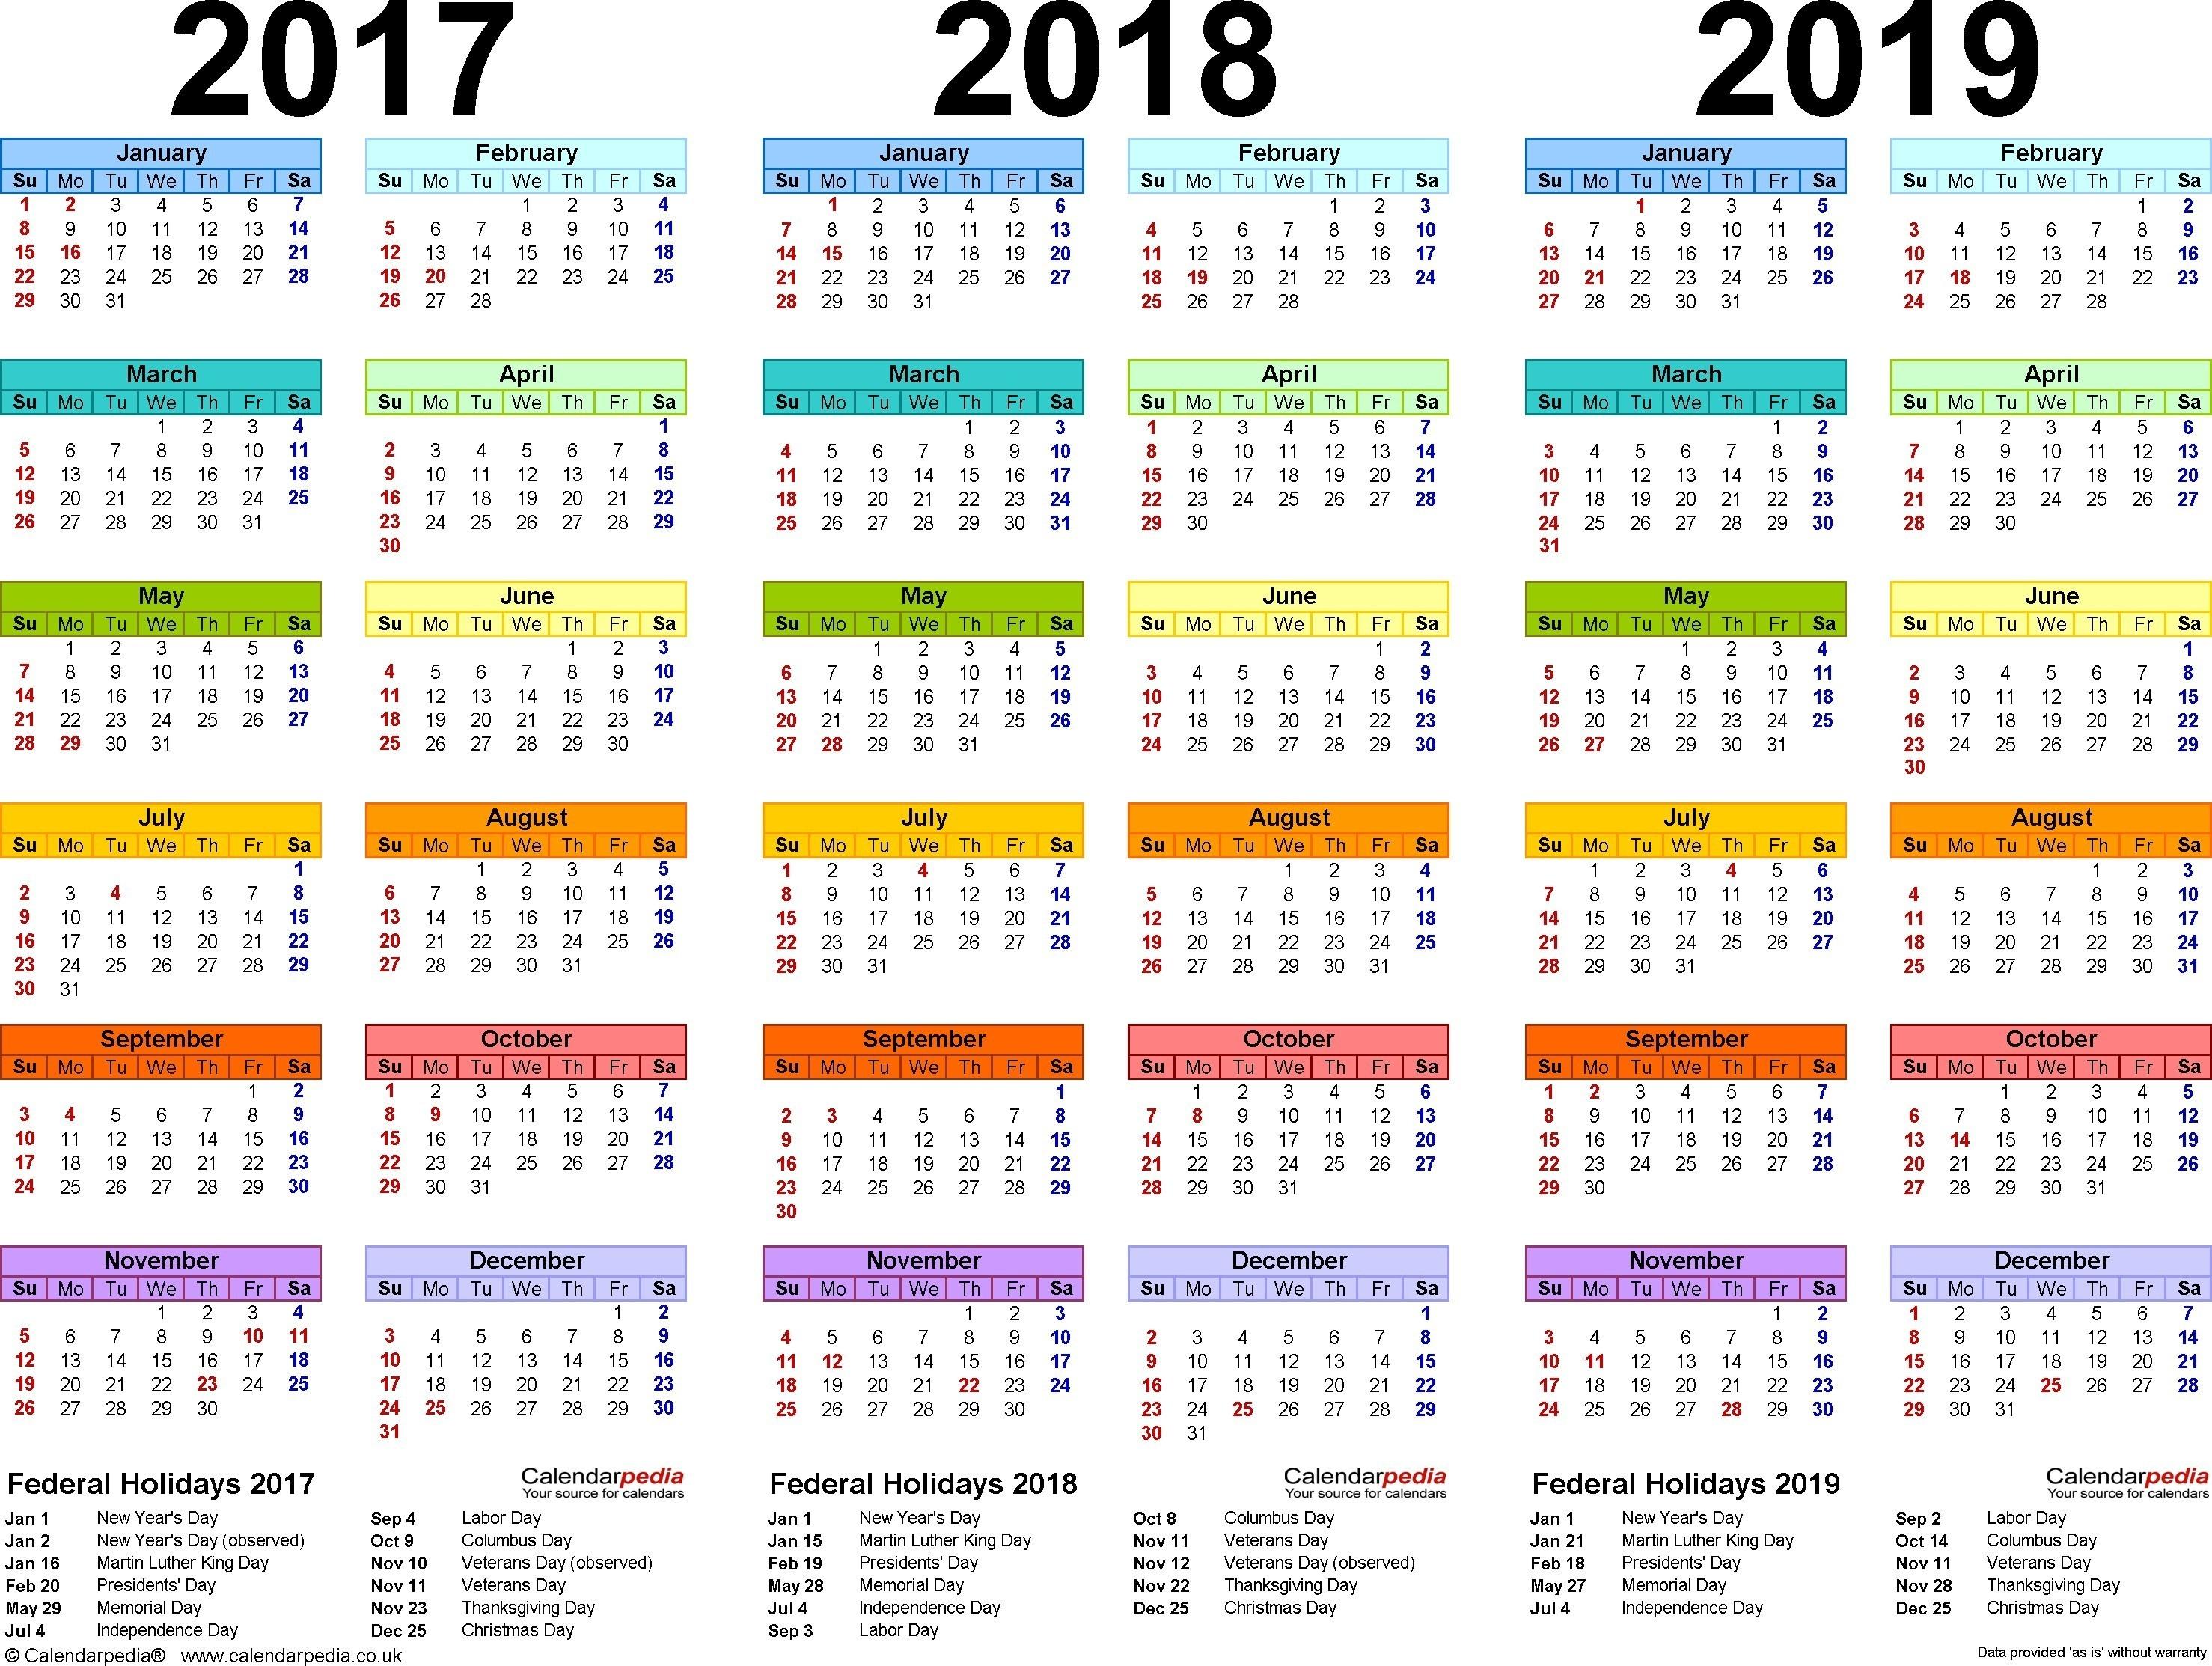 Depo-Provera Printable Calendar July 2019 | Calendar Template  Depo Provera Calendar Printable Pdf